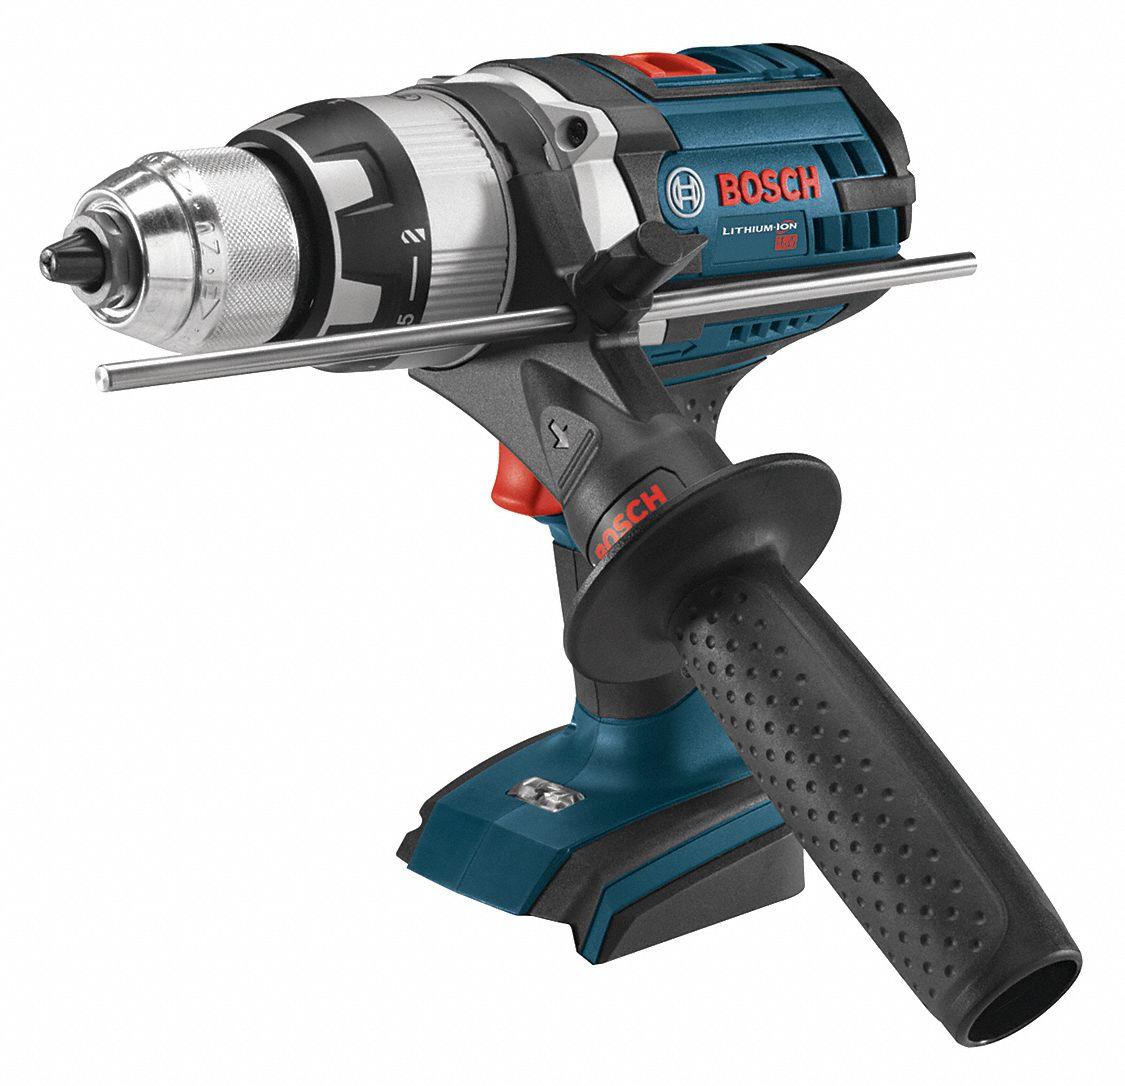 bosch 1 2 cordless hammer drill driver 18 0 voltage. Black Bedroom Furniture Sets. Home Design Ideas